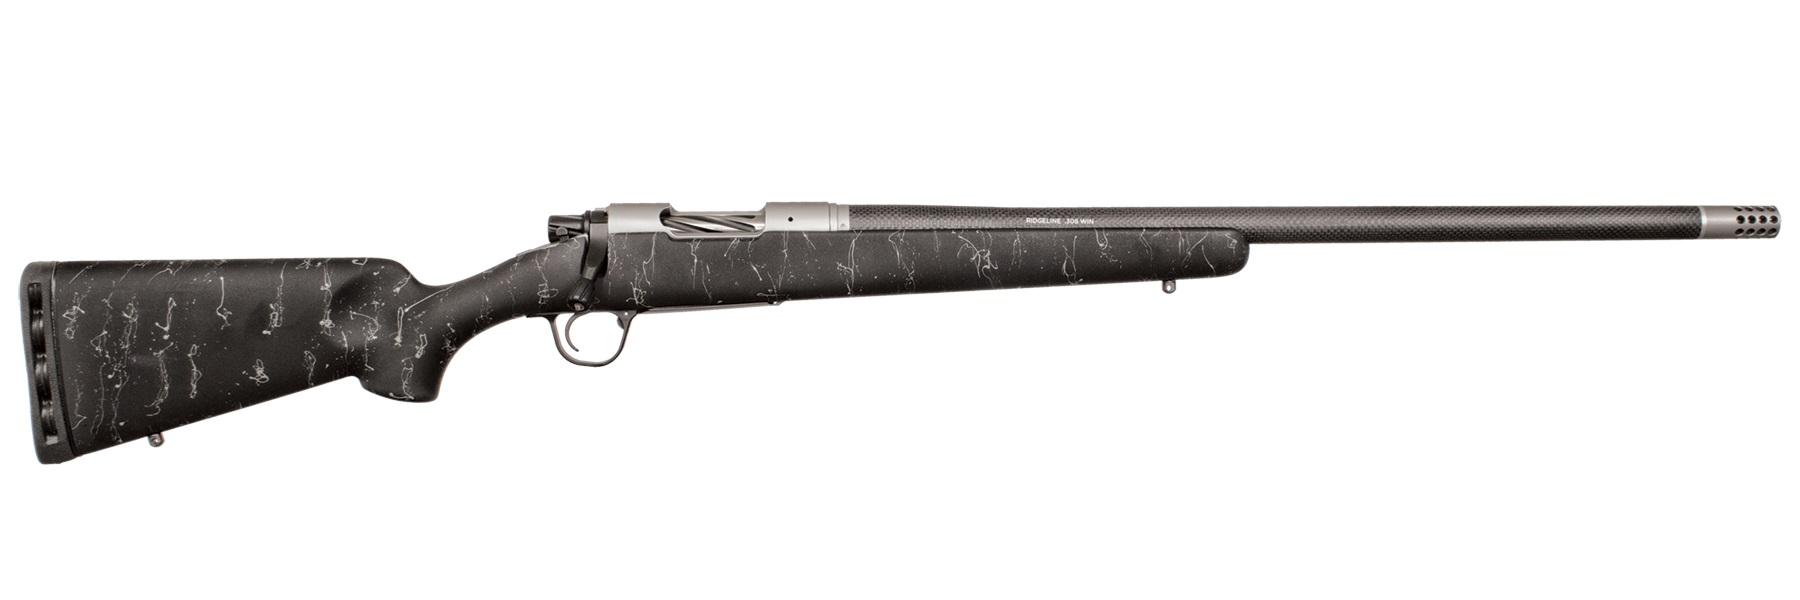 Christensen Arms Ridgeline 6.5 Creedmoor